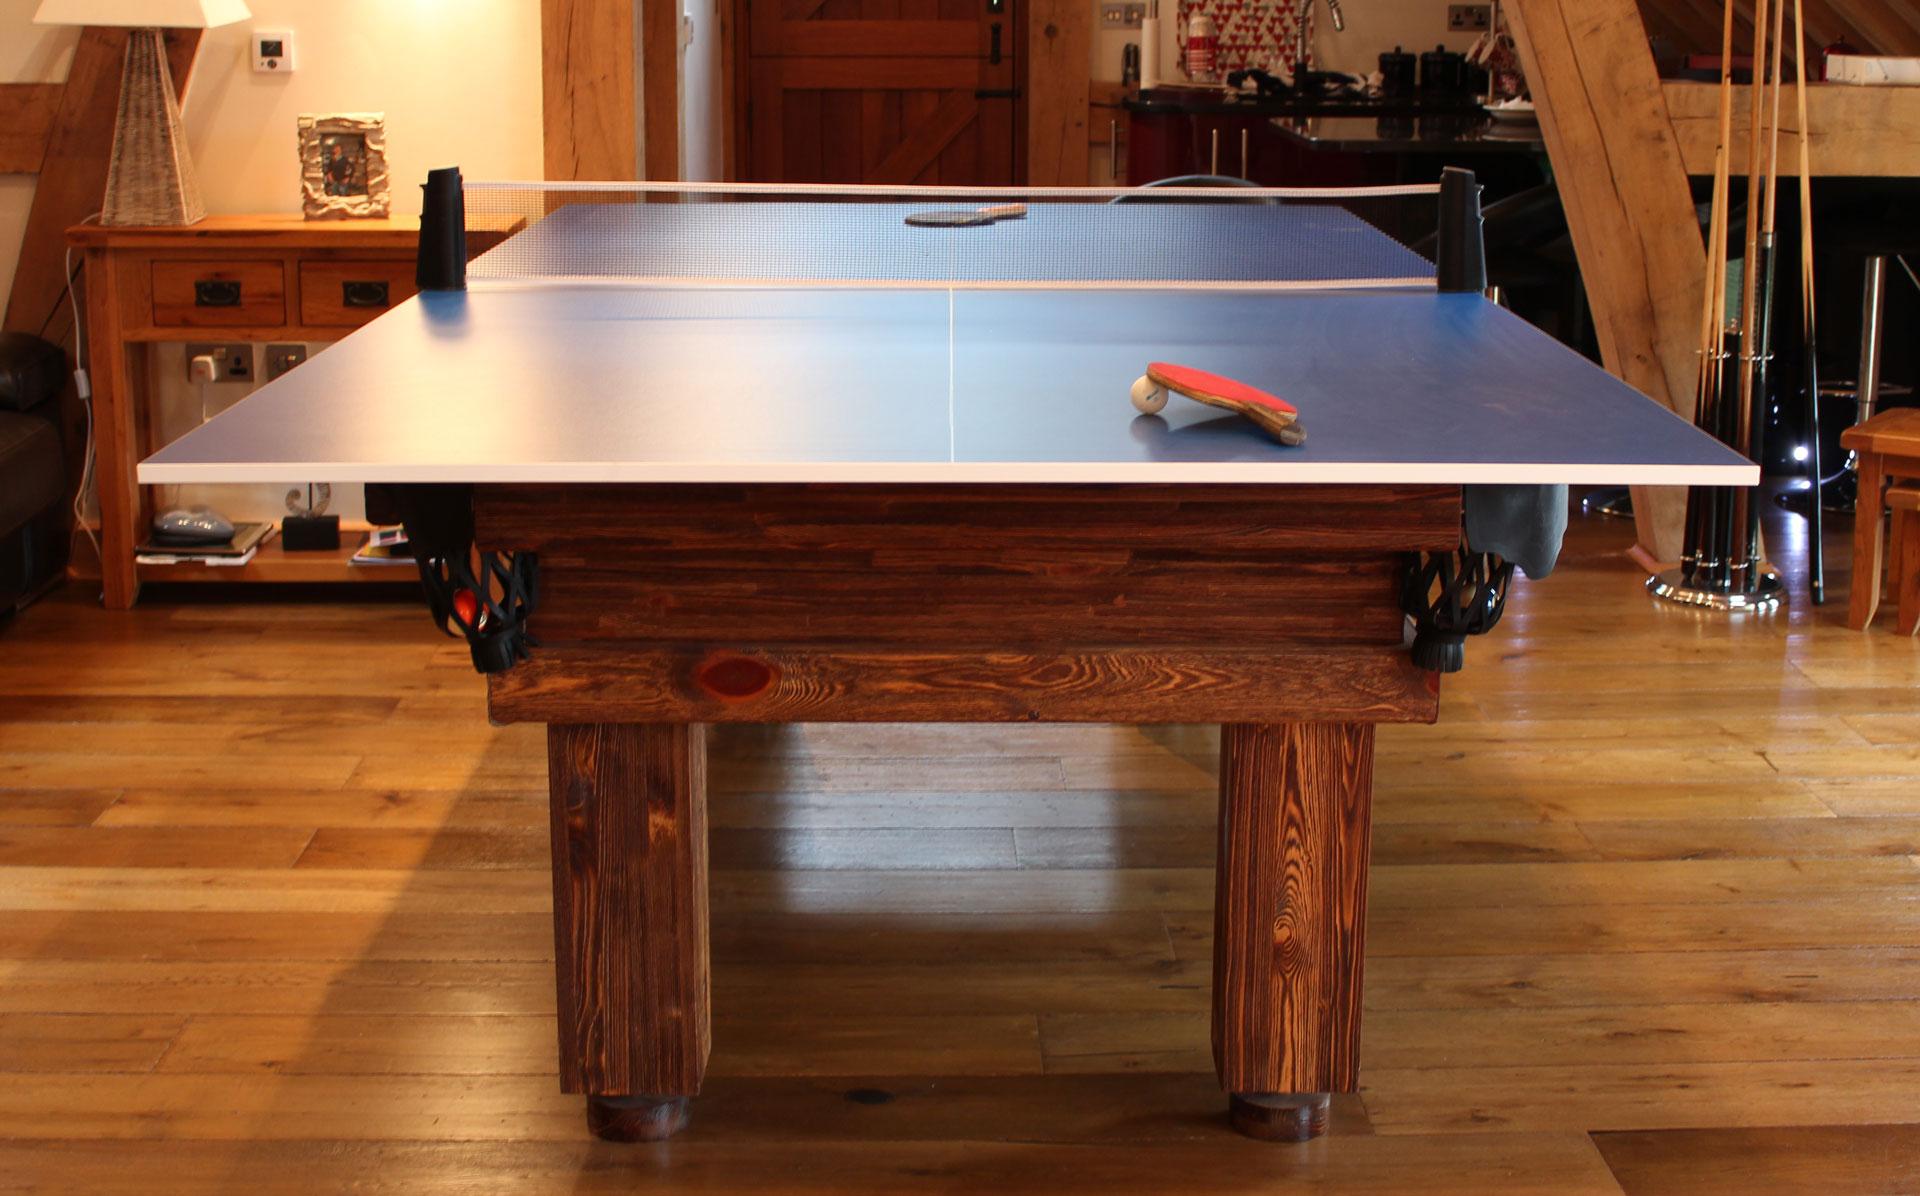 Table tennis top luxury pool tables - Pool table table tennis ...